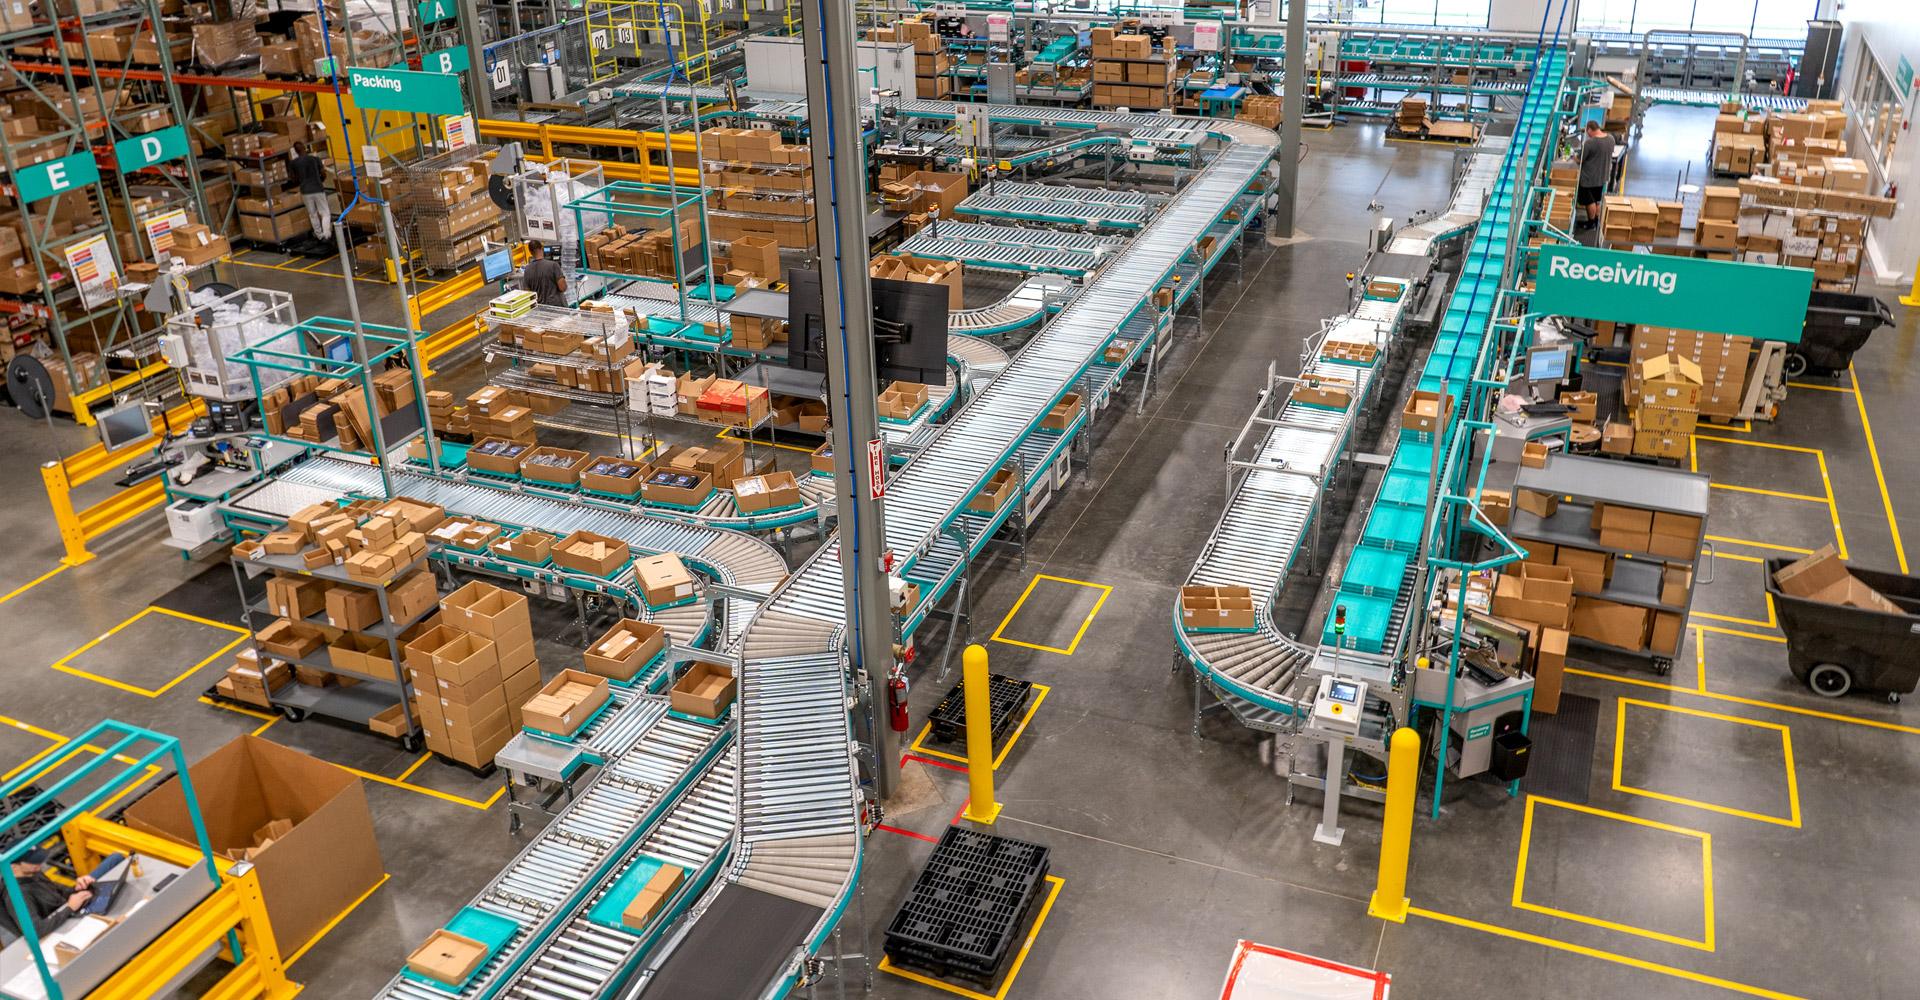 US Distribution Center